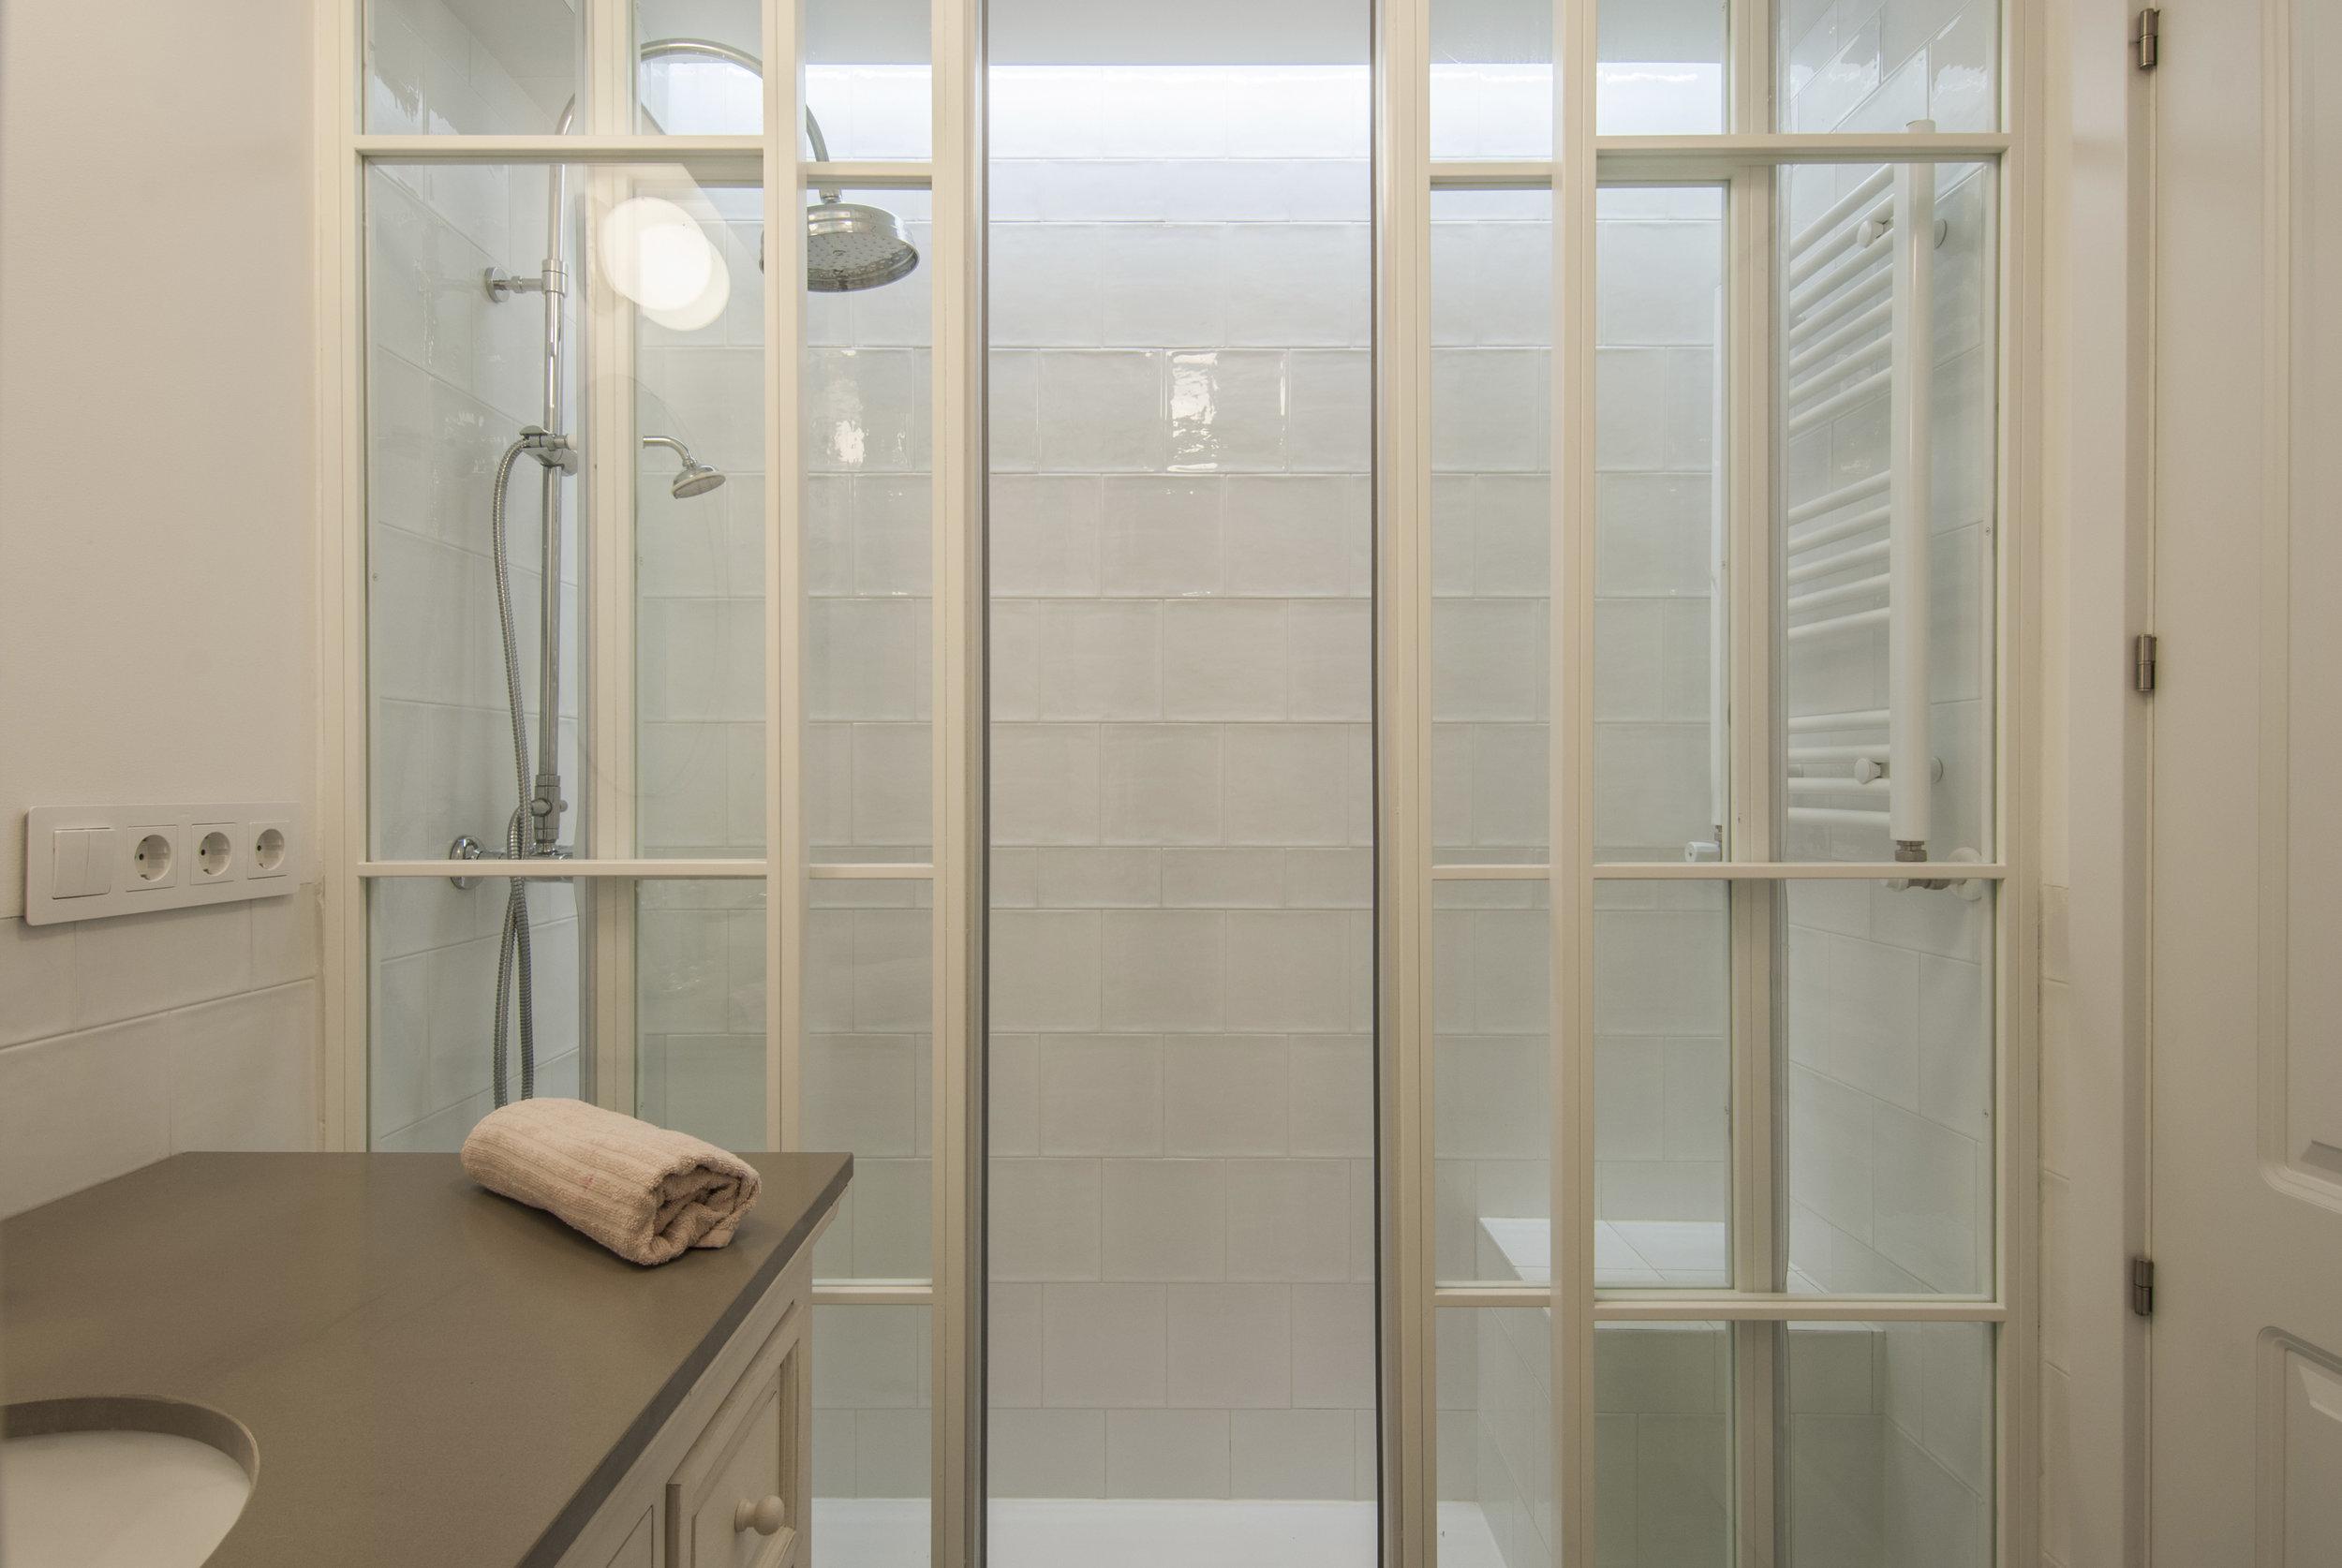 emmme studio slow design interiorismo integral baño chicas mampara hogar Debora.jpg